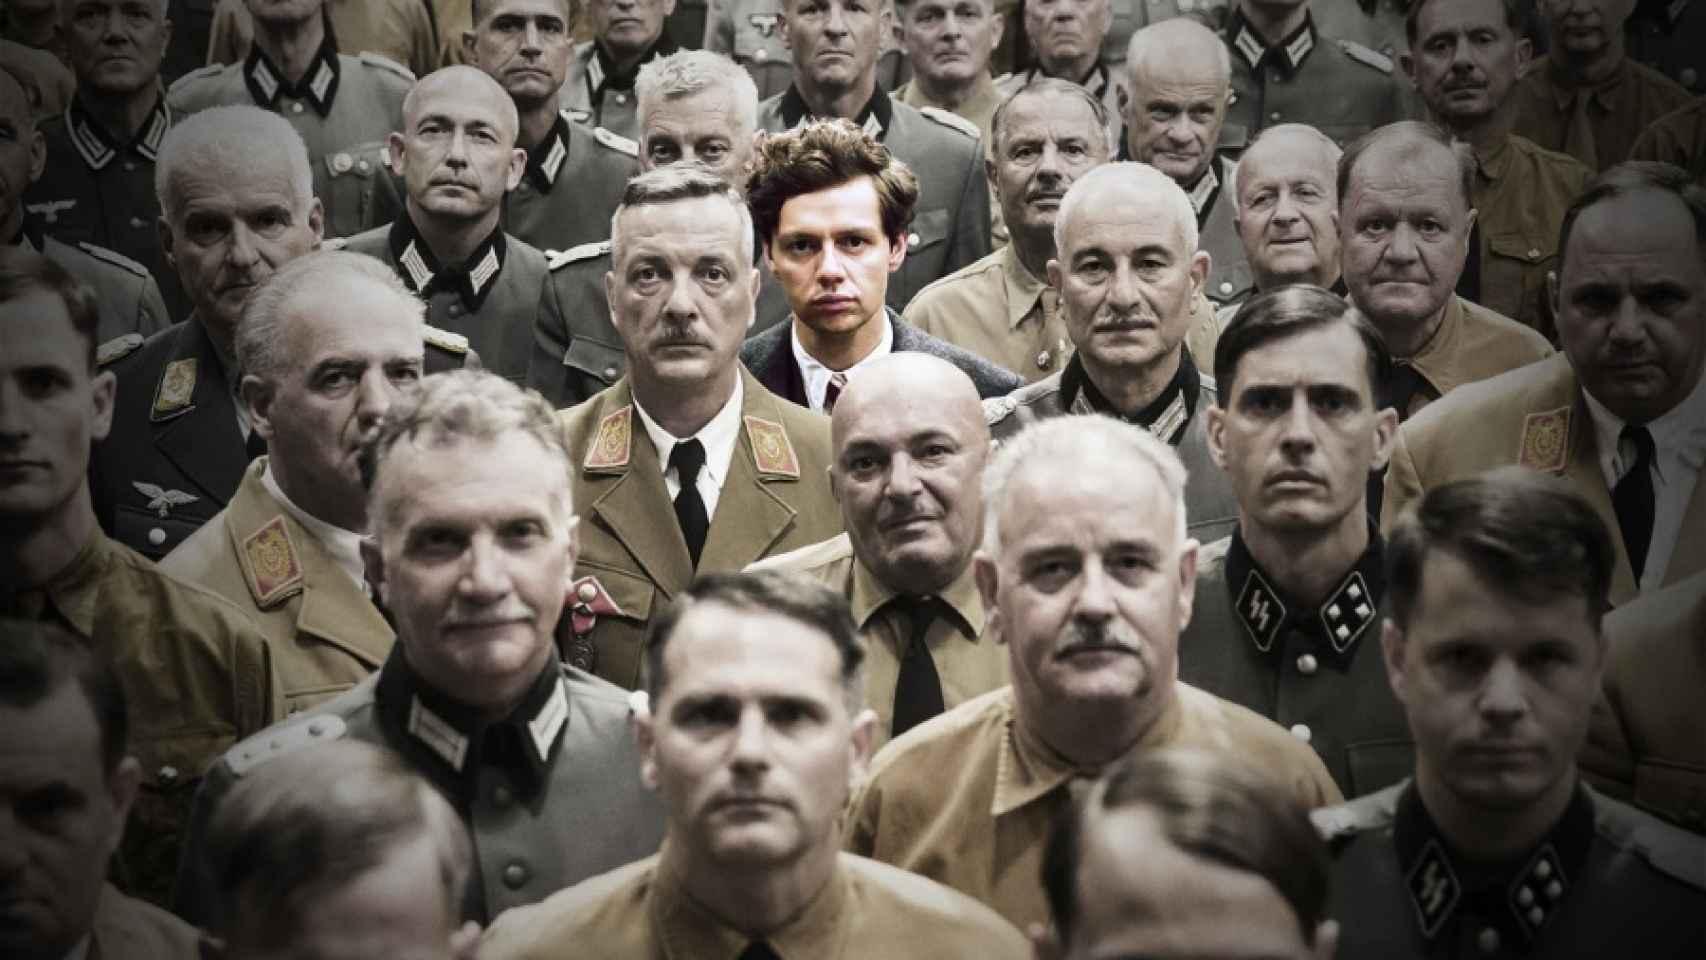 La película recrea la historia de Georg Elser.